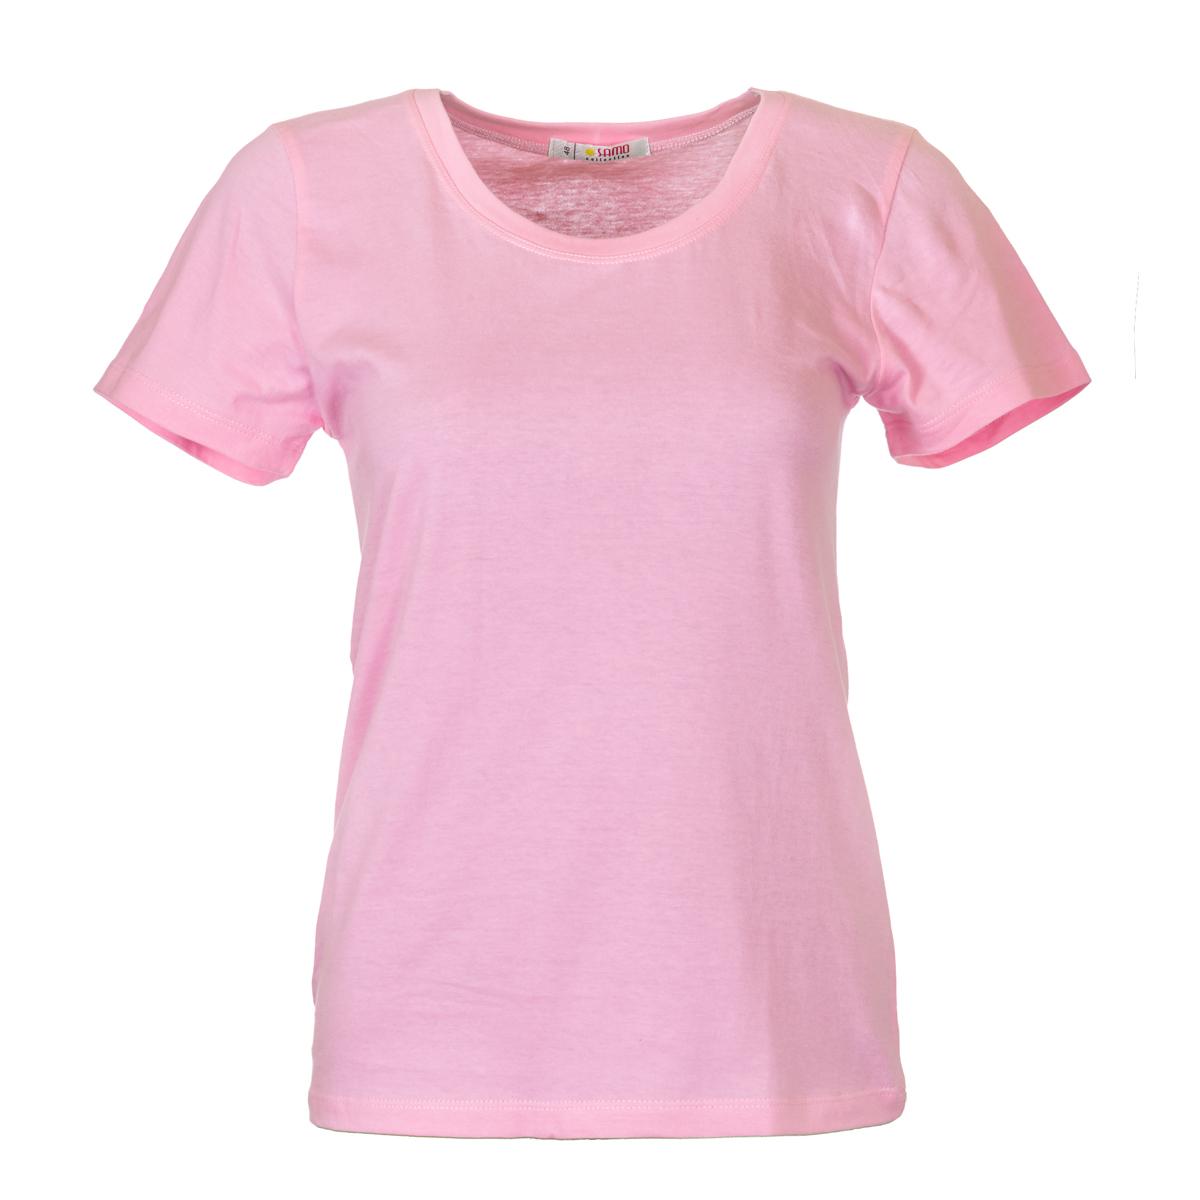 Жен. футболка арт. 04-0045 Розовый р. 50Майки и футболки<br>Фактический ОГ: 84 см <br>Фактический ОТ: 82 см <br>Фактический ОБ: 94 см <br>Длина по спинке: 59 см <br>Рост: 164-170 см<br><br>Тип: Жен. футболка<br>Размер: 50<br>Материал: Супрем